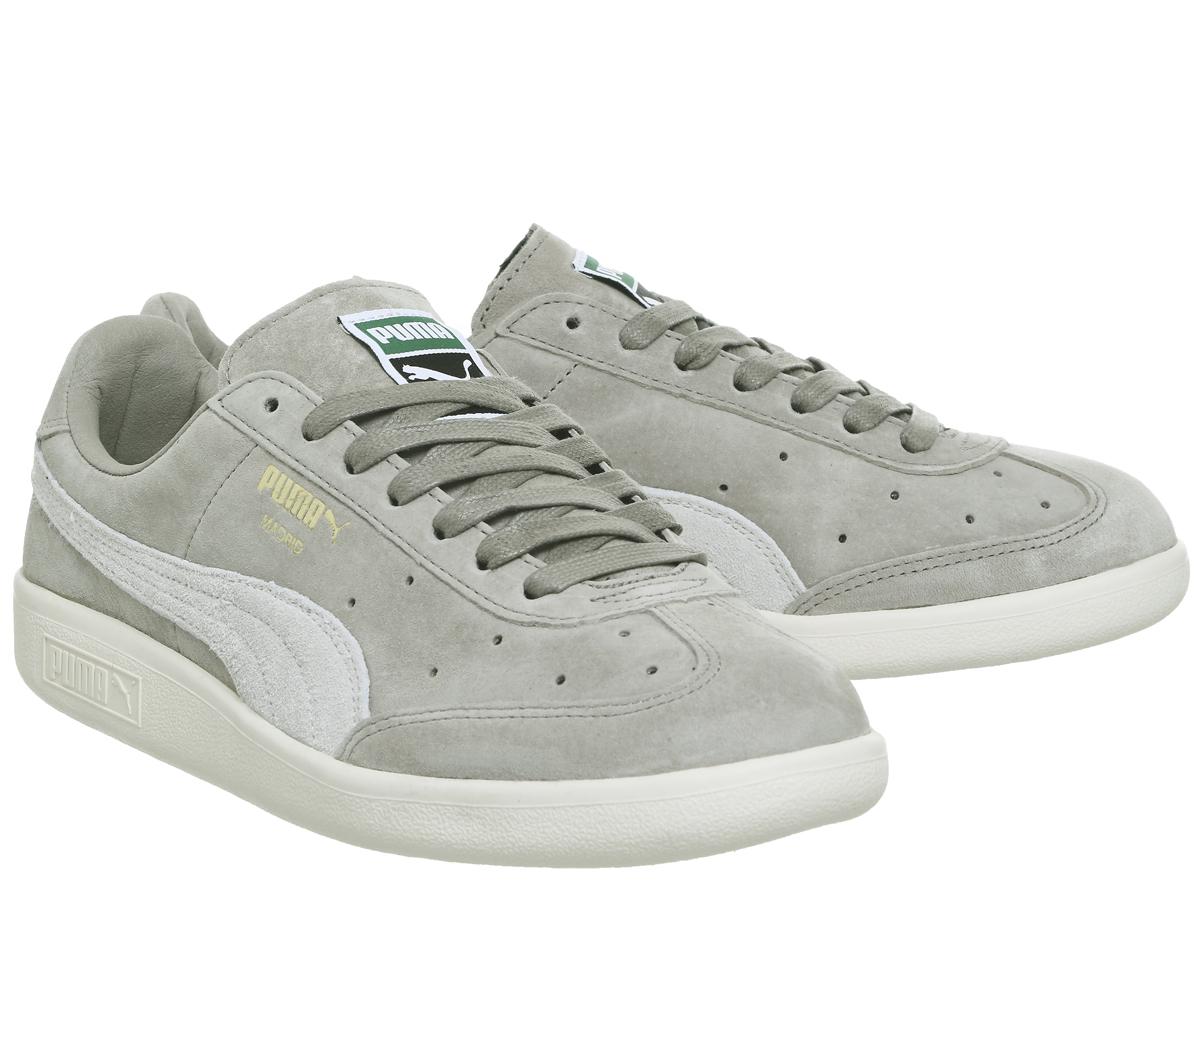 Mens Puma Madrid Trainers VINTAGE KHAKI WHISPER WHITE Trainers Shoes ... dbac36cce